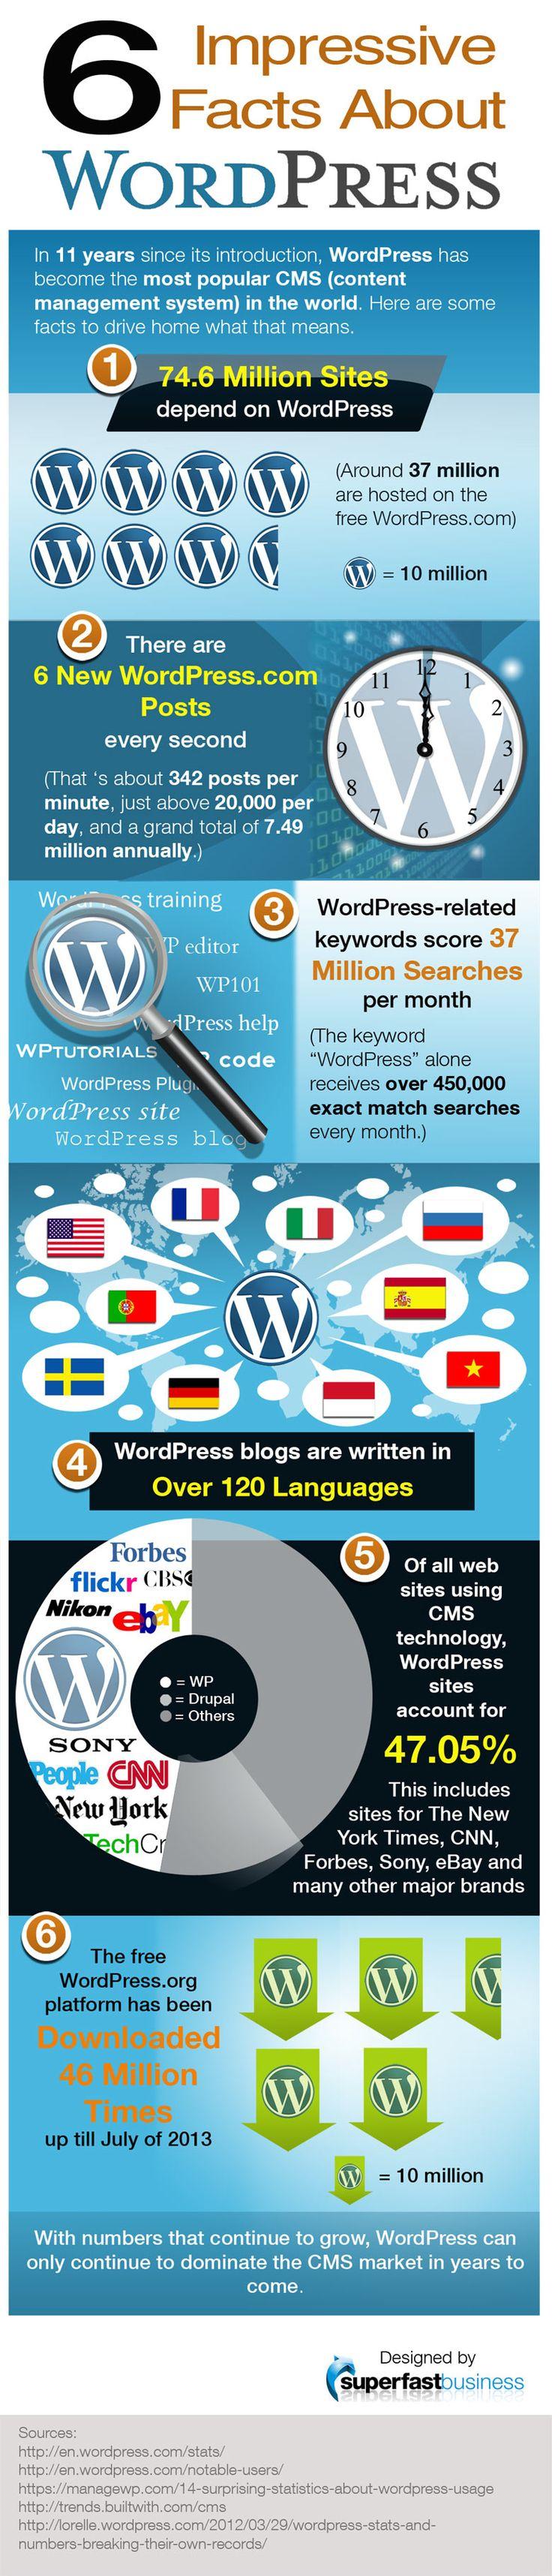 6 impressive wordpress facts, an infographic: http://hosting.ber-art.nl/impressive-wordpress-facts/ via @BerriePelser - #WordPress